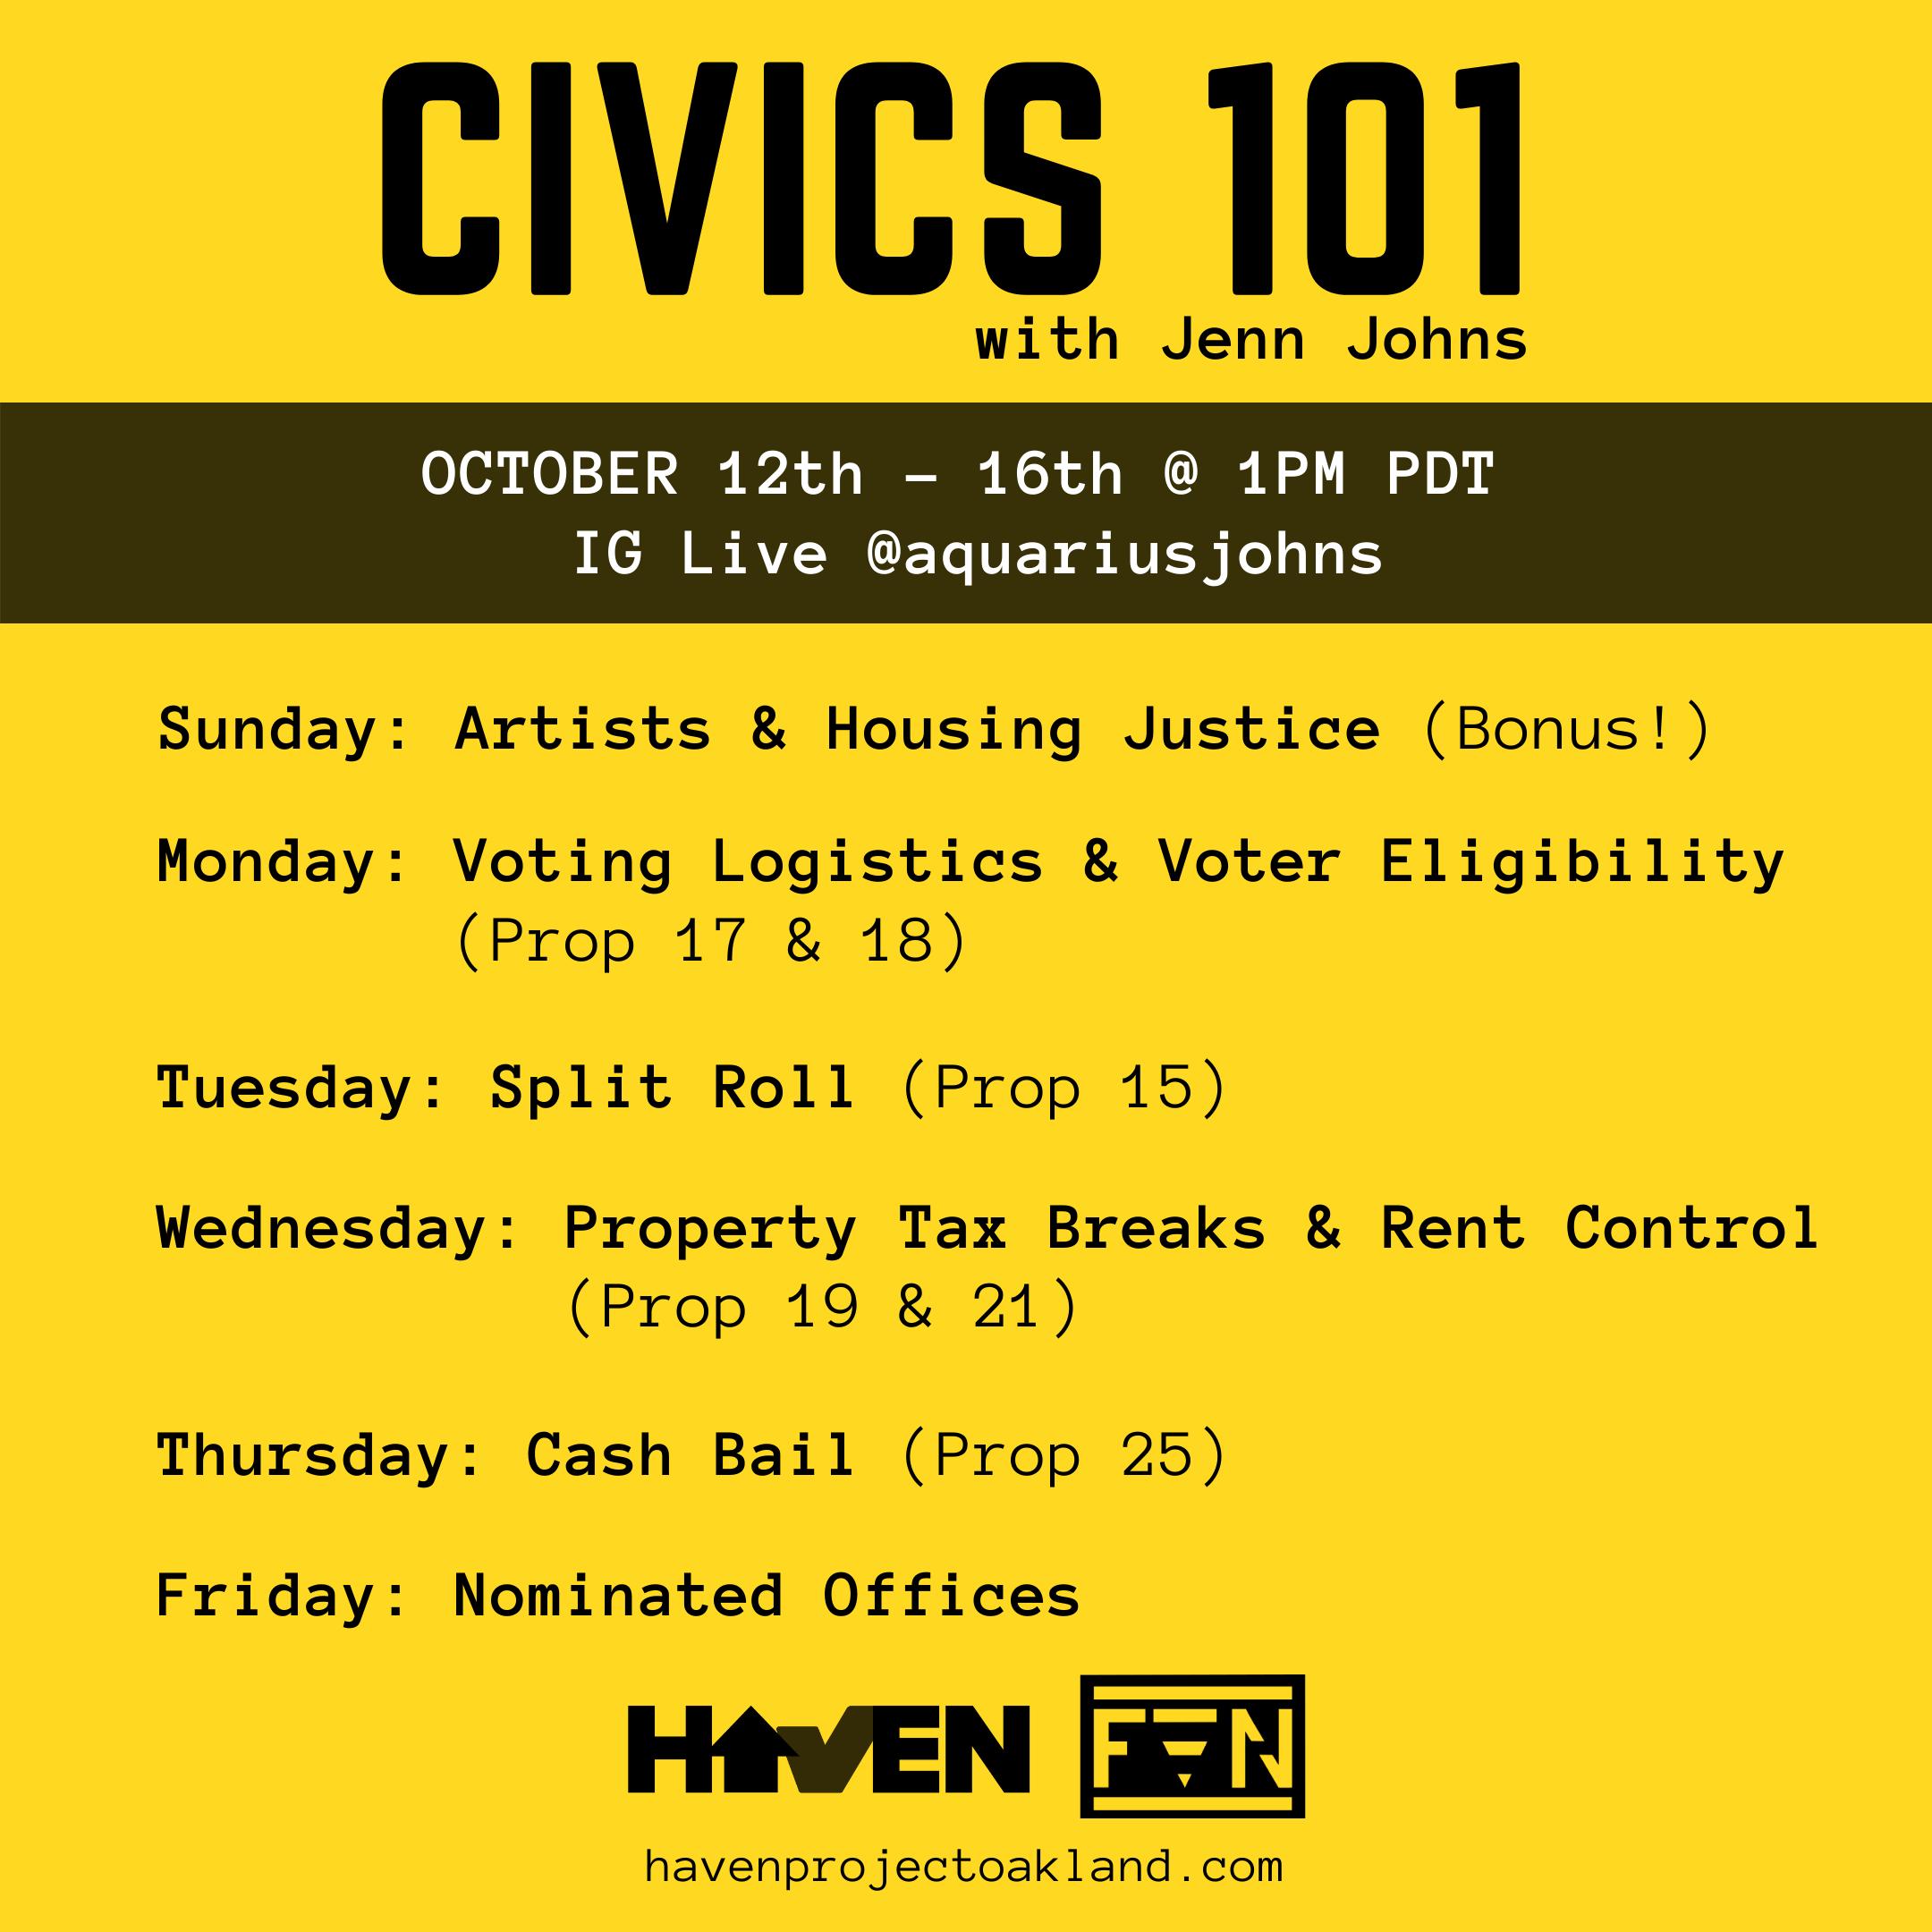 Civics 101 Schedule